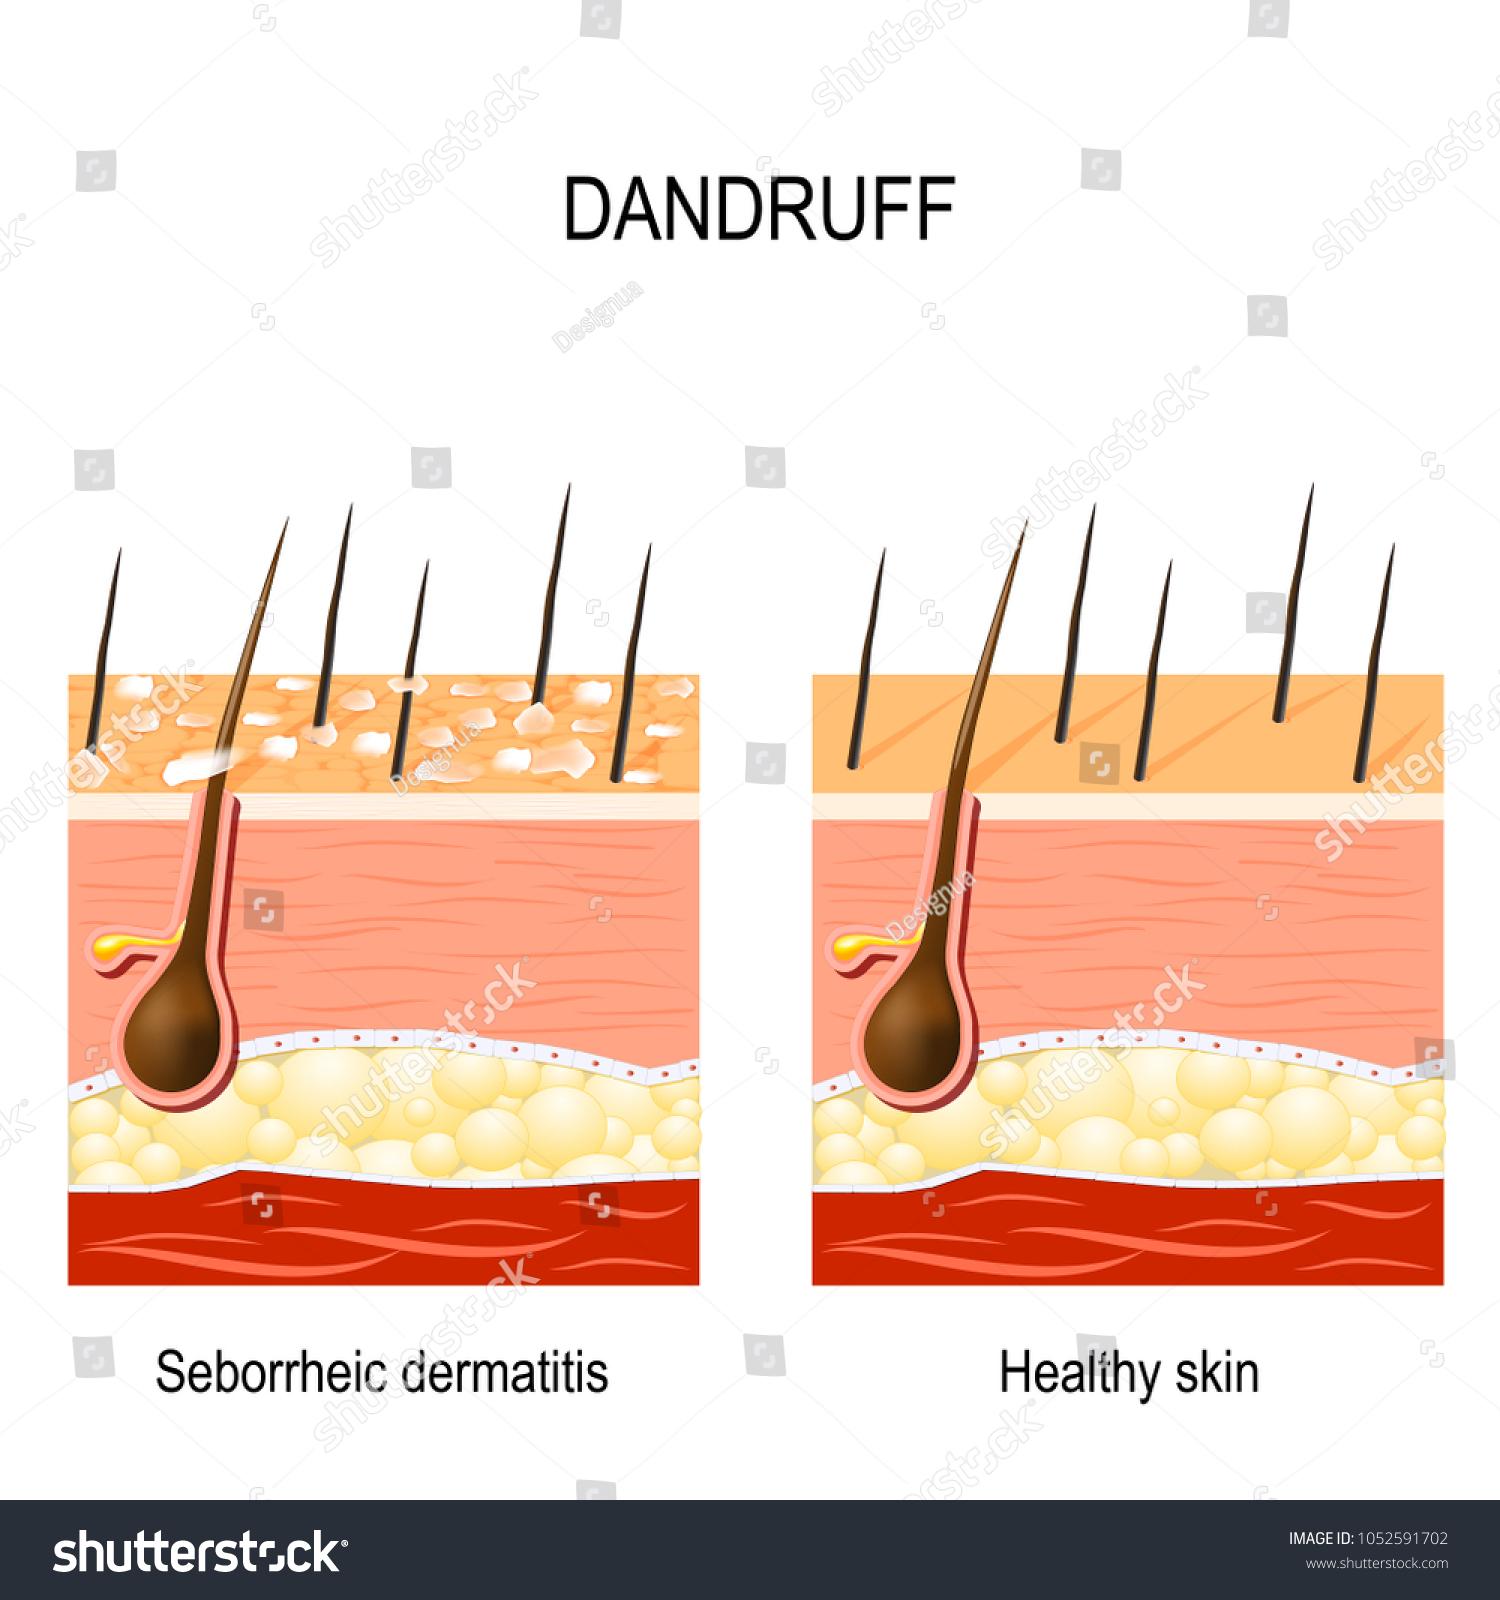 dandruff seborrheic dermatitis can occur due stock vector (royalty free)  1052591702  shutterstock